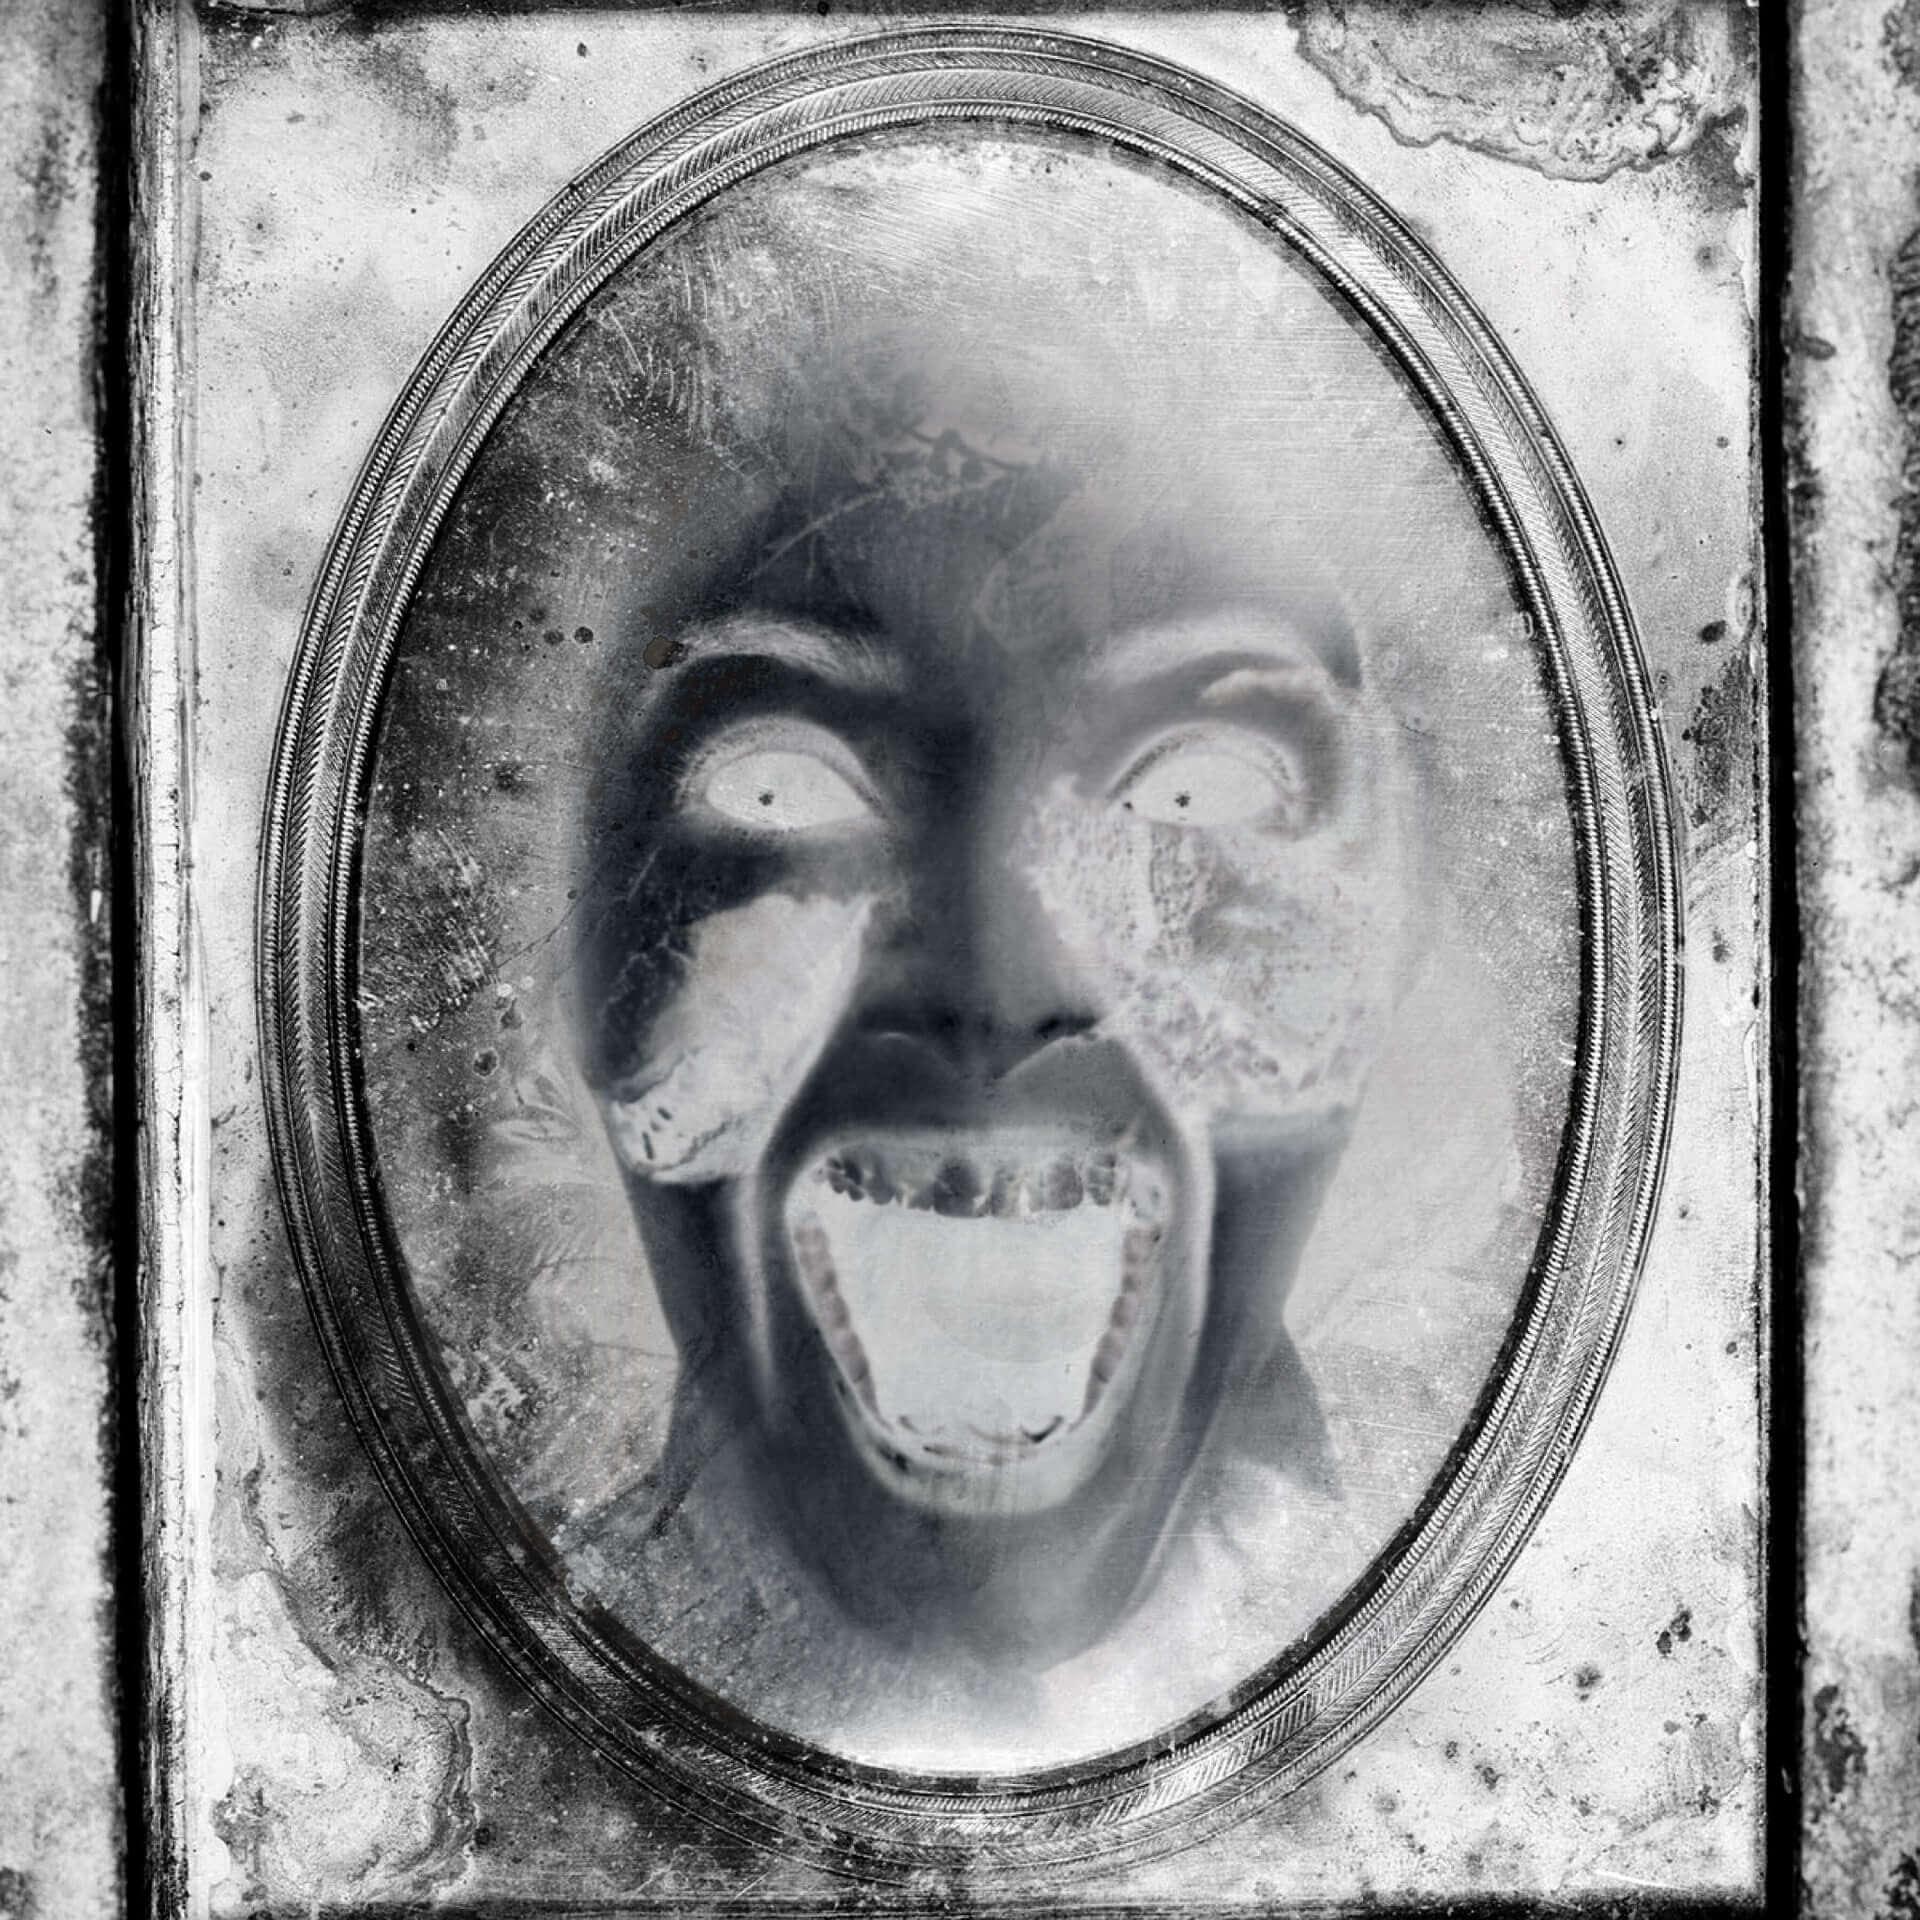 Post Mortem on Halloween Spooky Mirror - RenkoLondon Blog